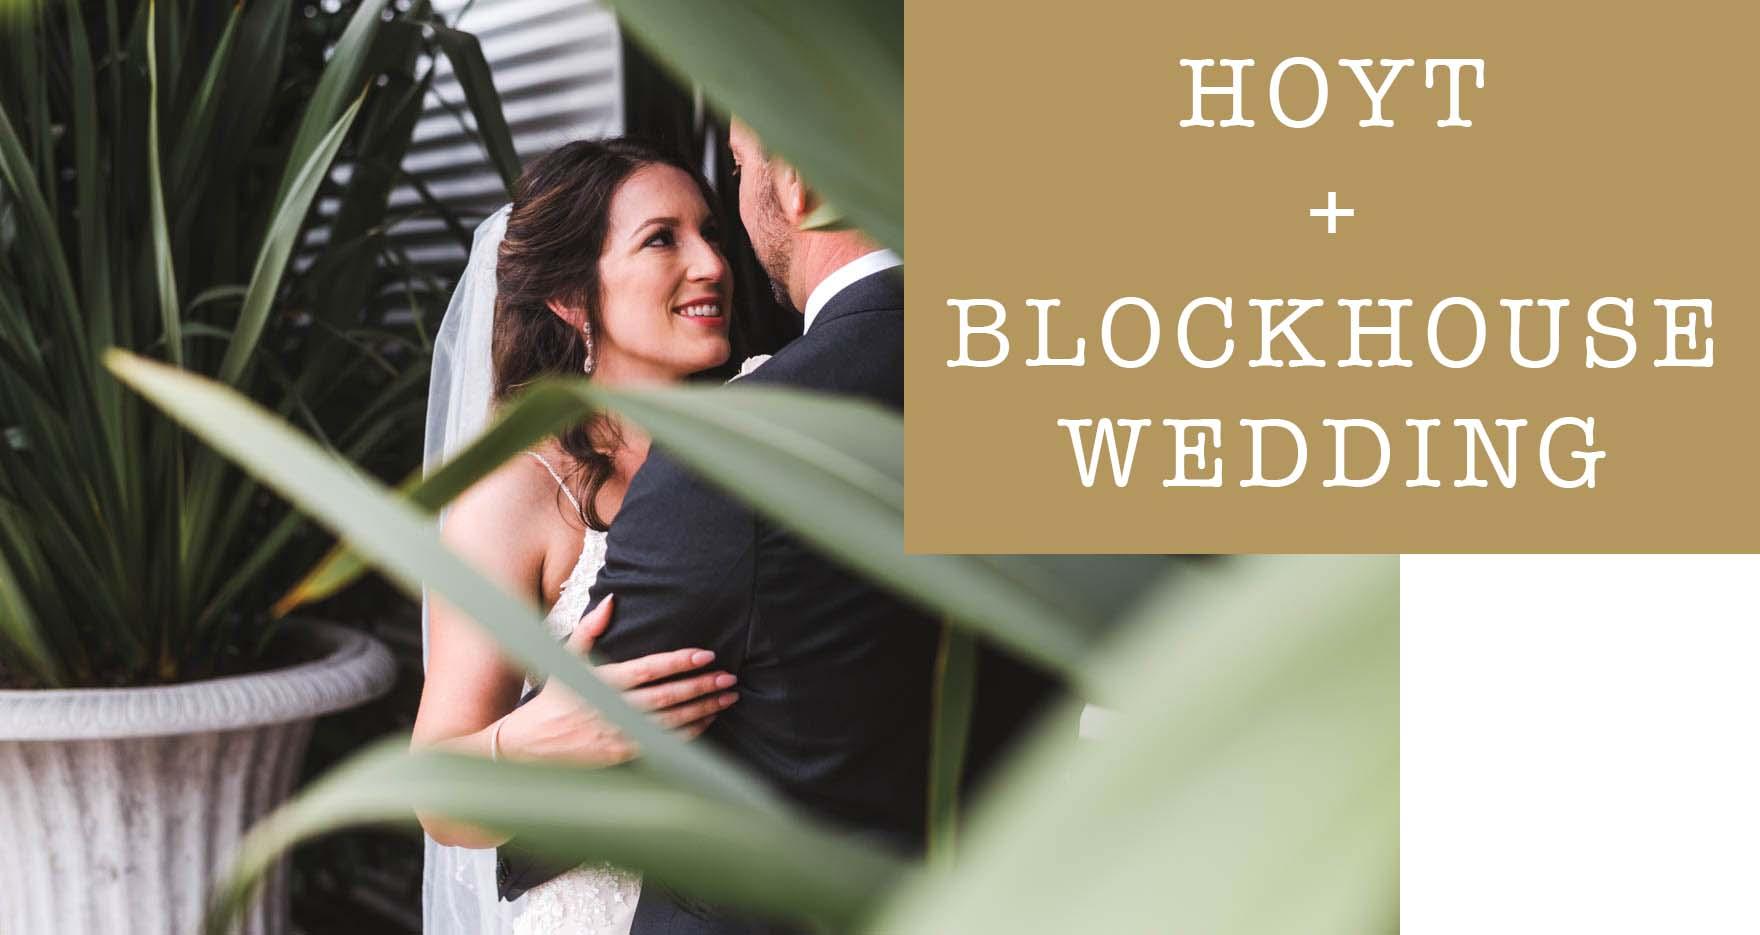 Blockhouse Wedding Blog Cover